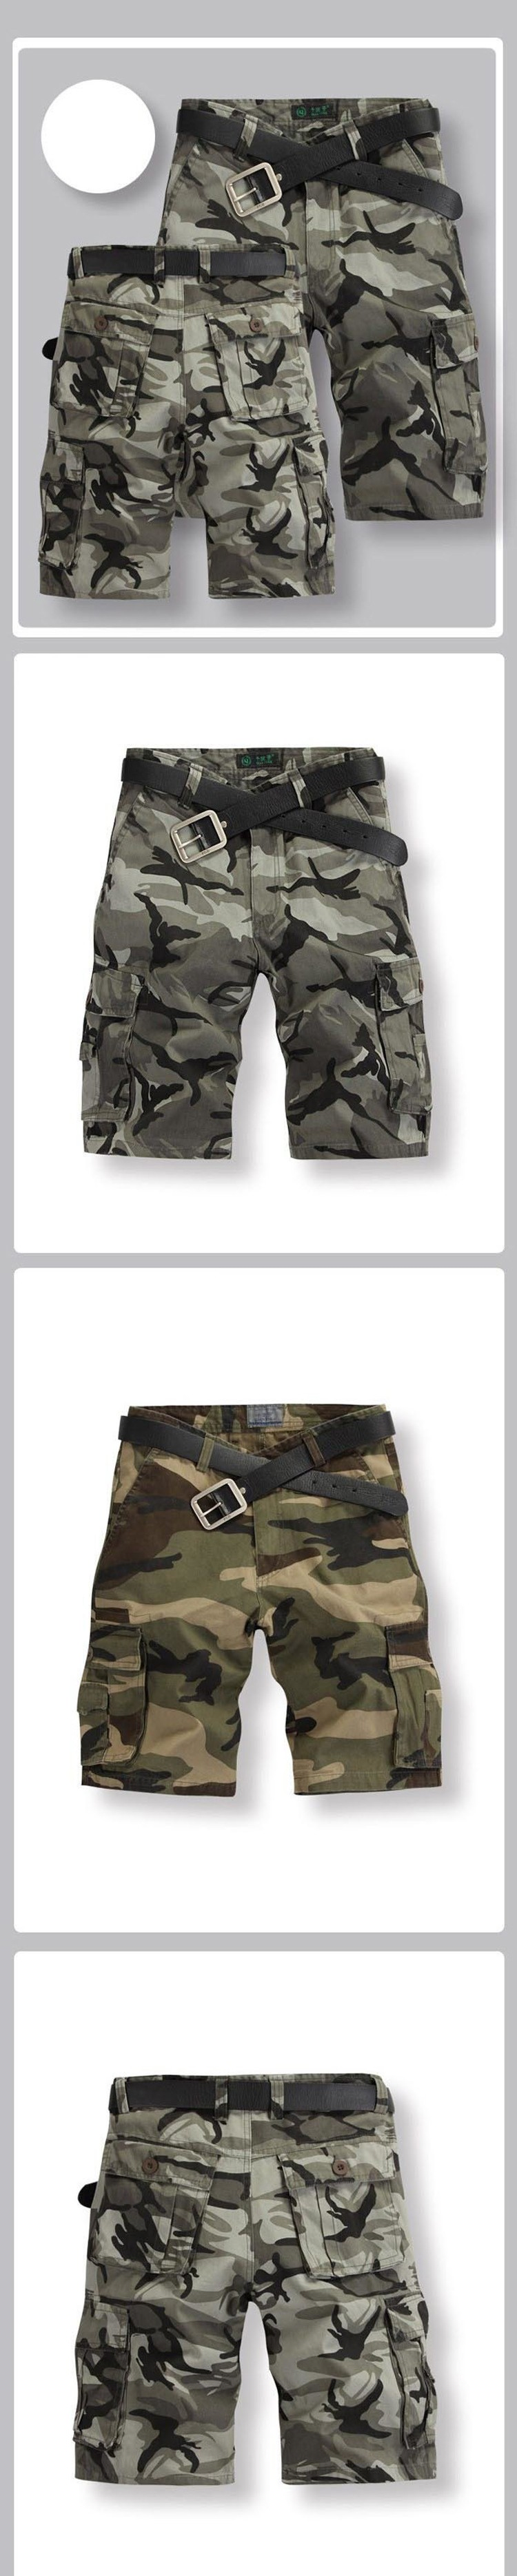 cargo shorts (5)